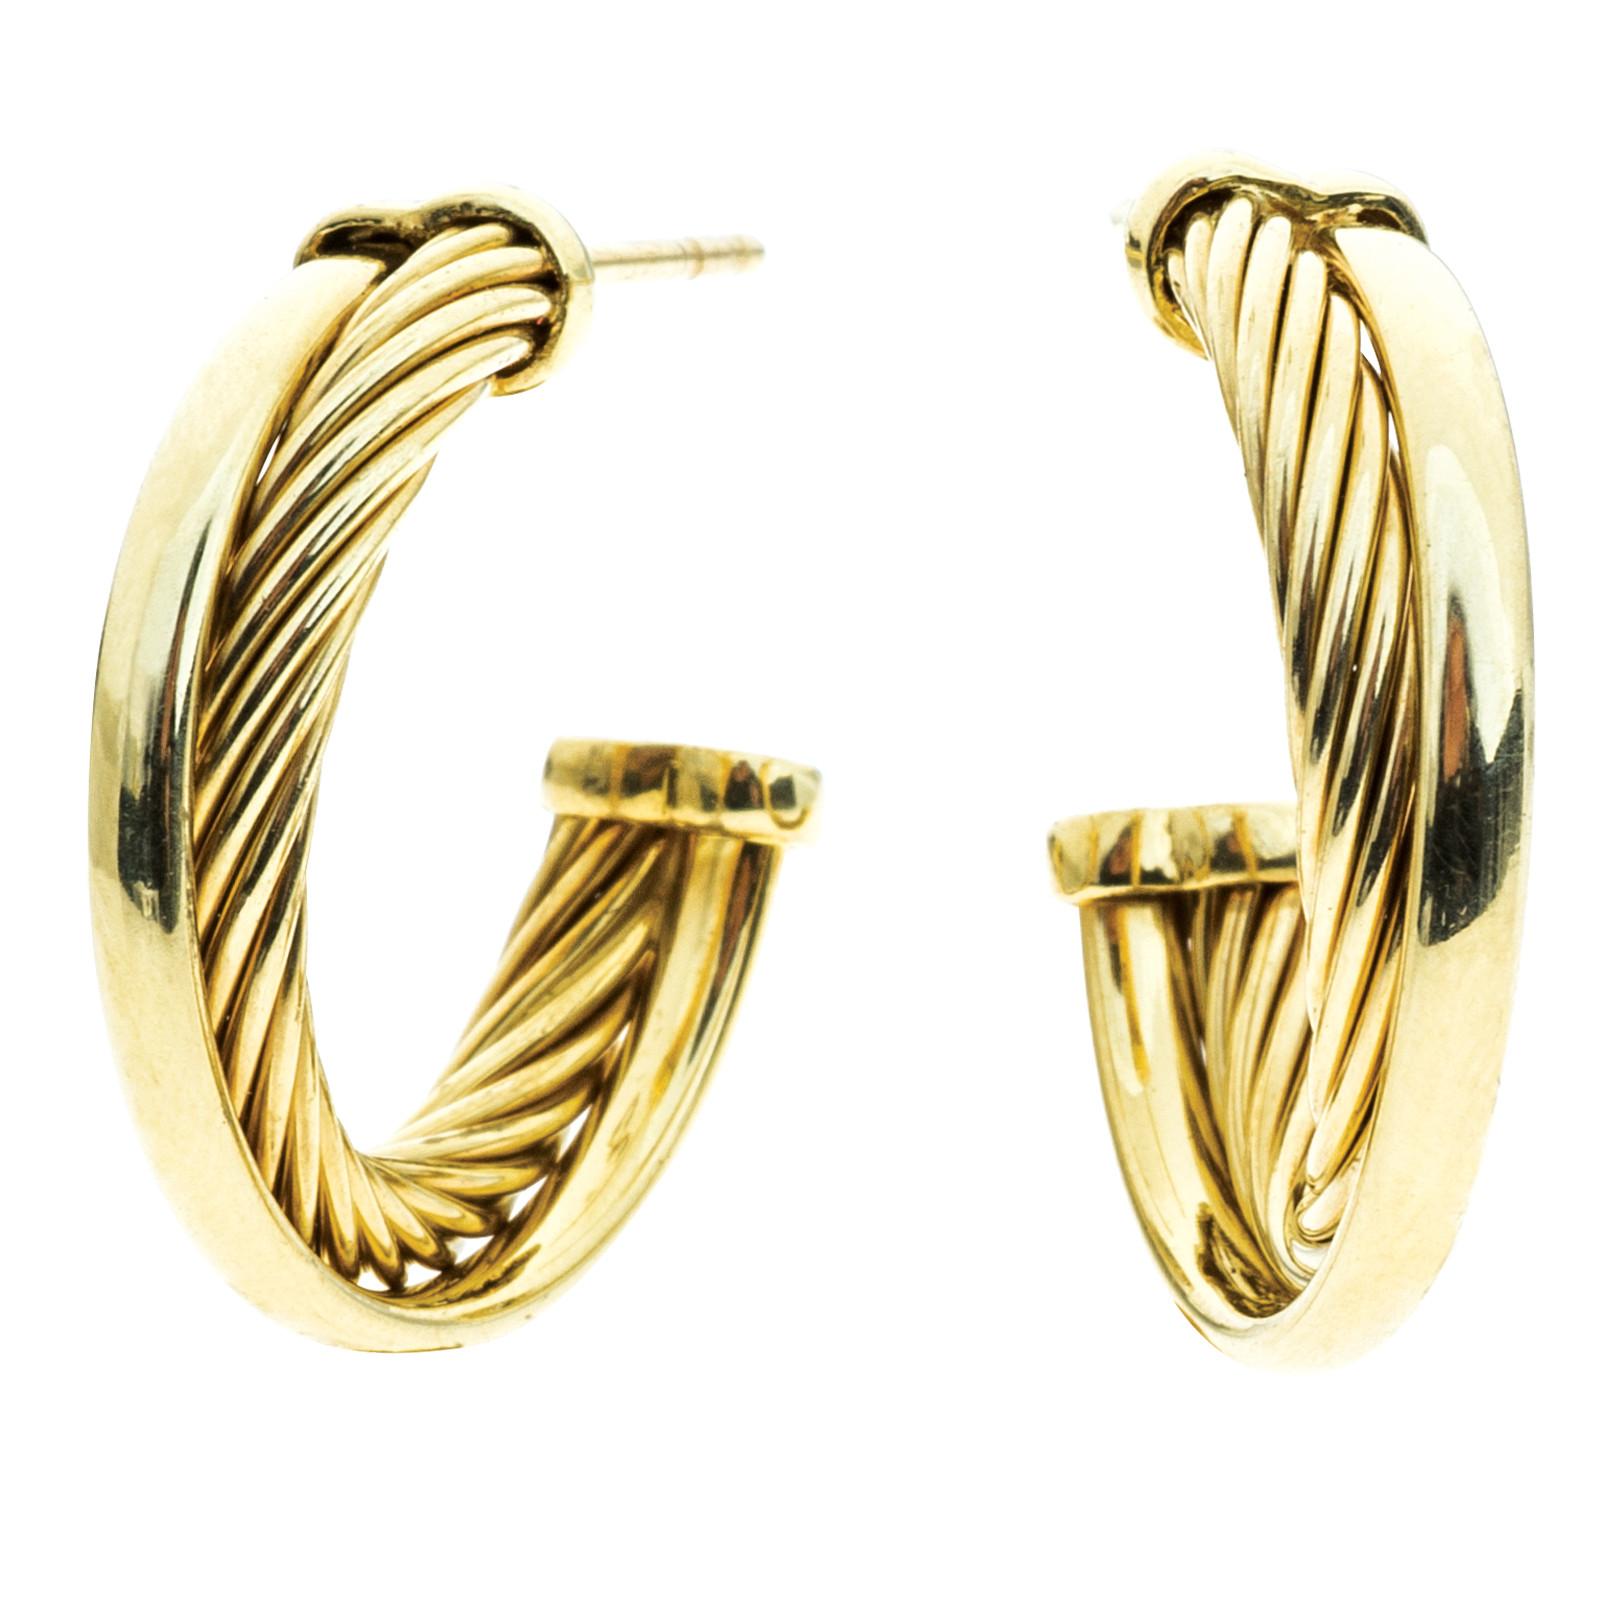 Vintage David Yurman Crossover Earrings